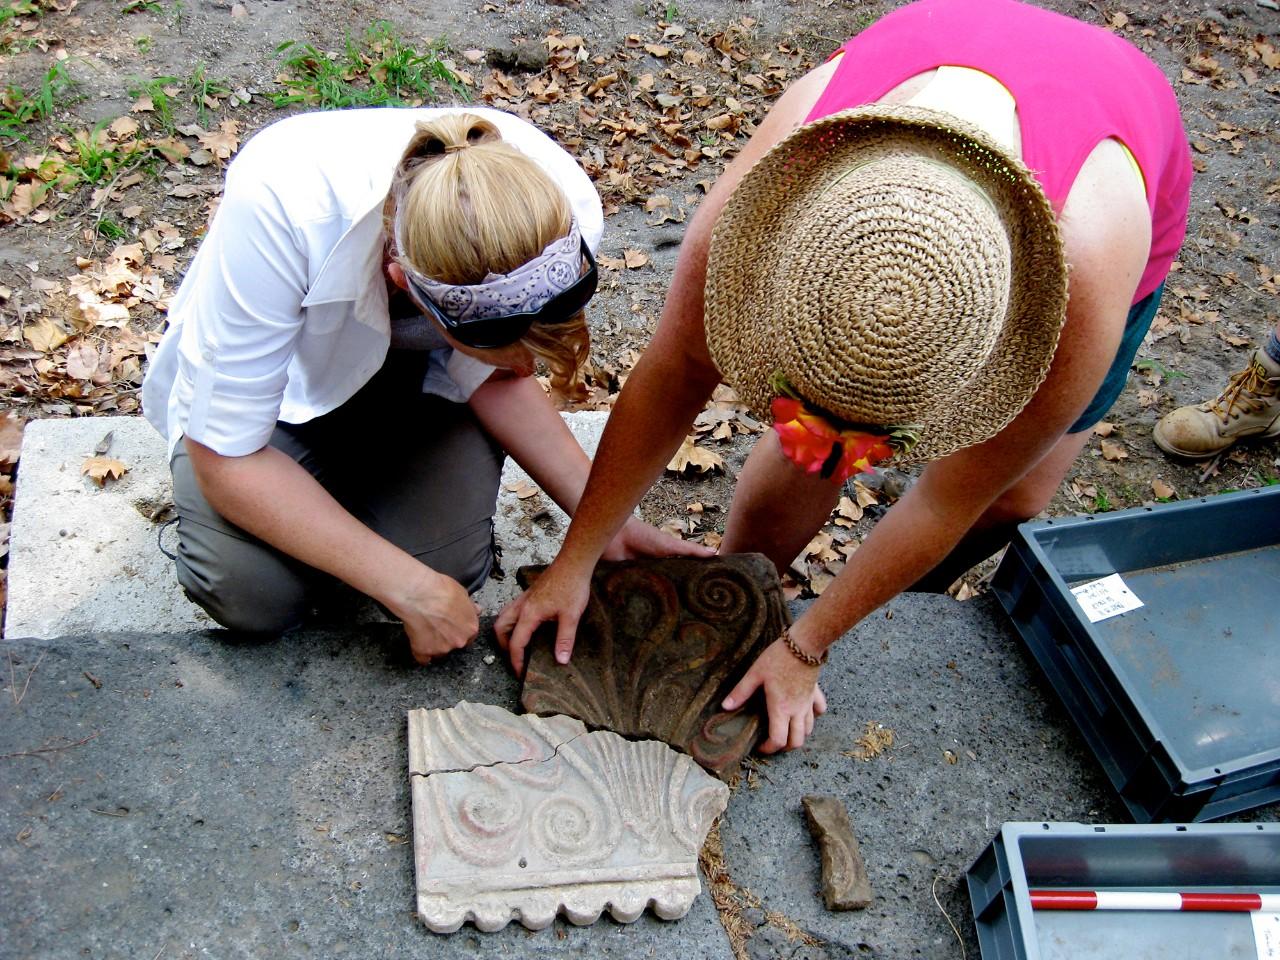 Two women kneel over Roman tablets